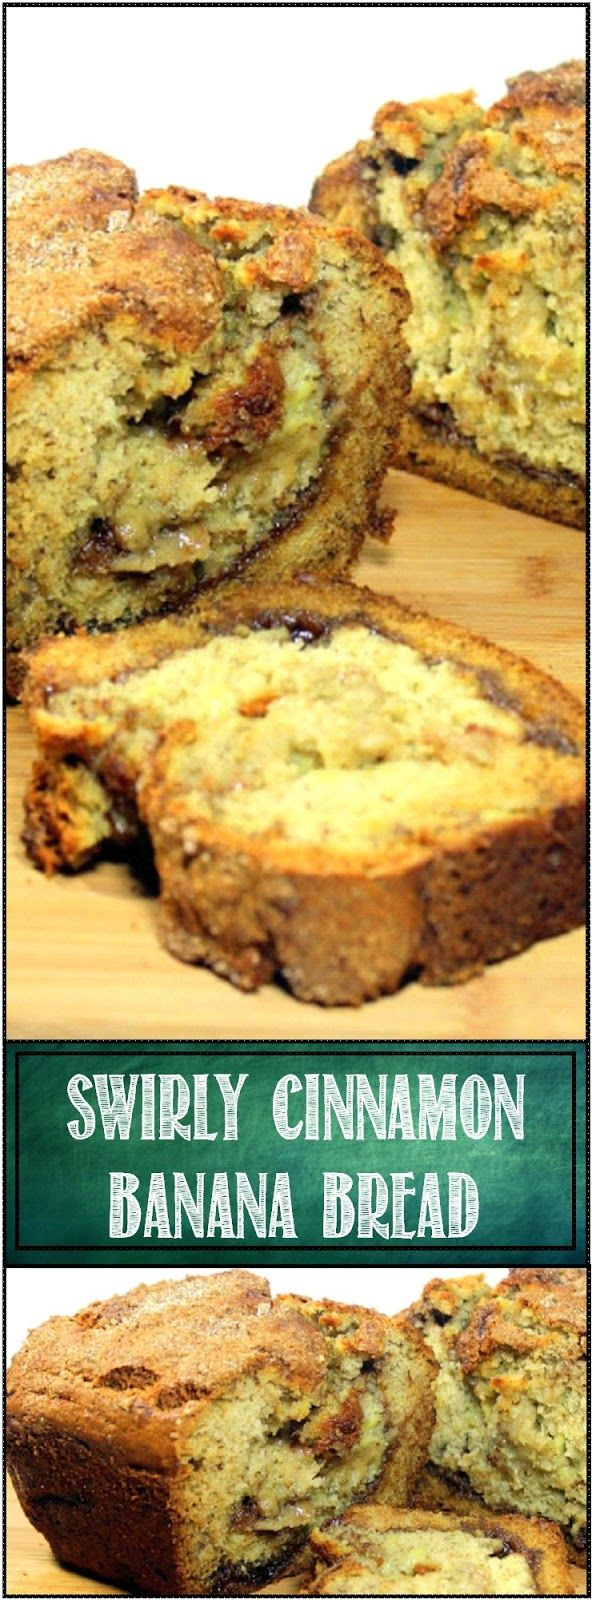 Inspired By eRecipeCards: Swirly Cinnamon Banana Bread